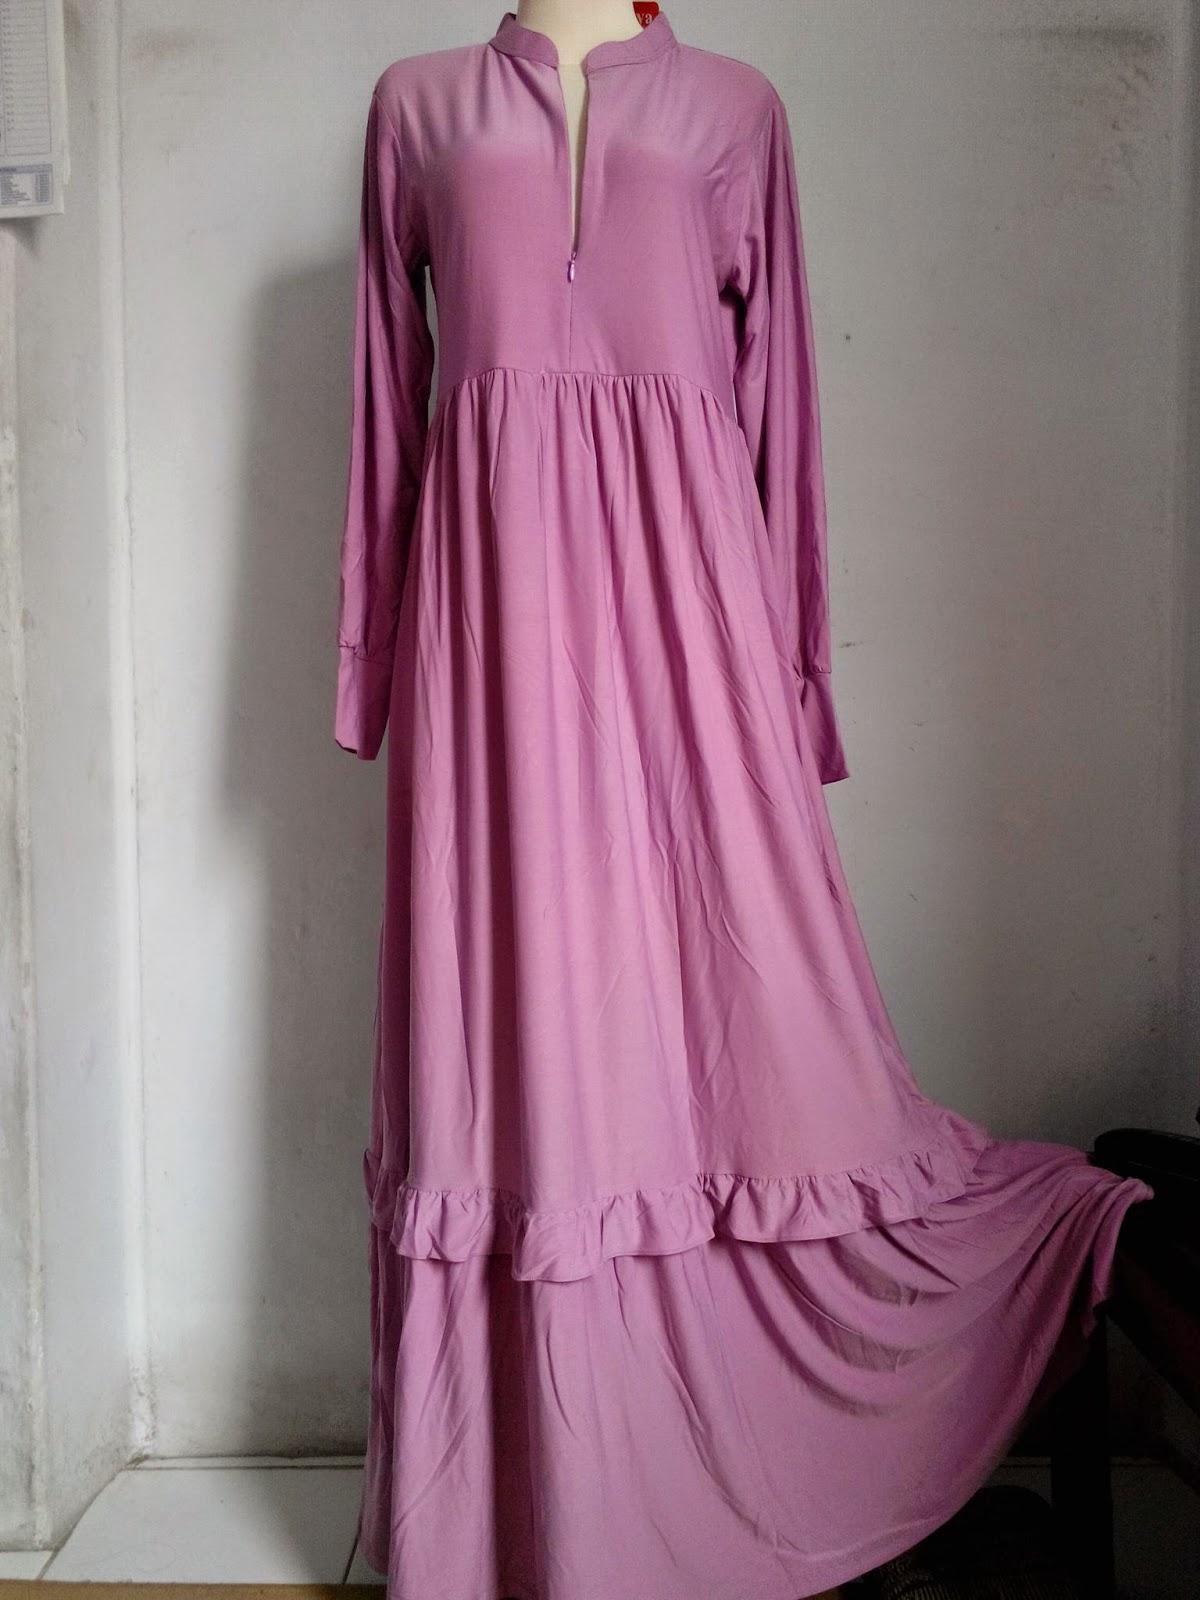 Gamis Muslimah Jersey Rempel Bahan Korea Berkualitas Halus Dan Tebal Pb 143 Ld 100 Lebar Bawah 115 Ready Warna Pink Dusty Ungu Hitam Coklat Moka Magenta